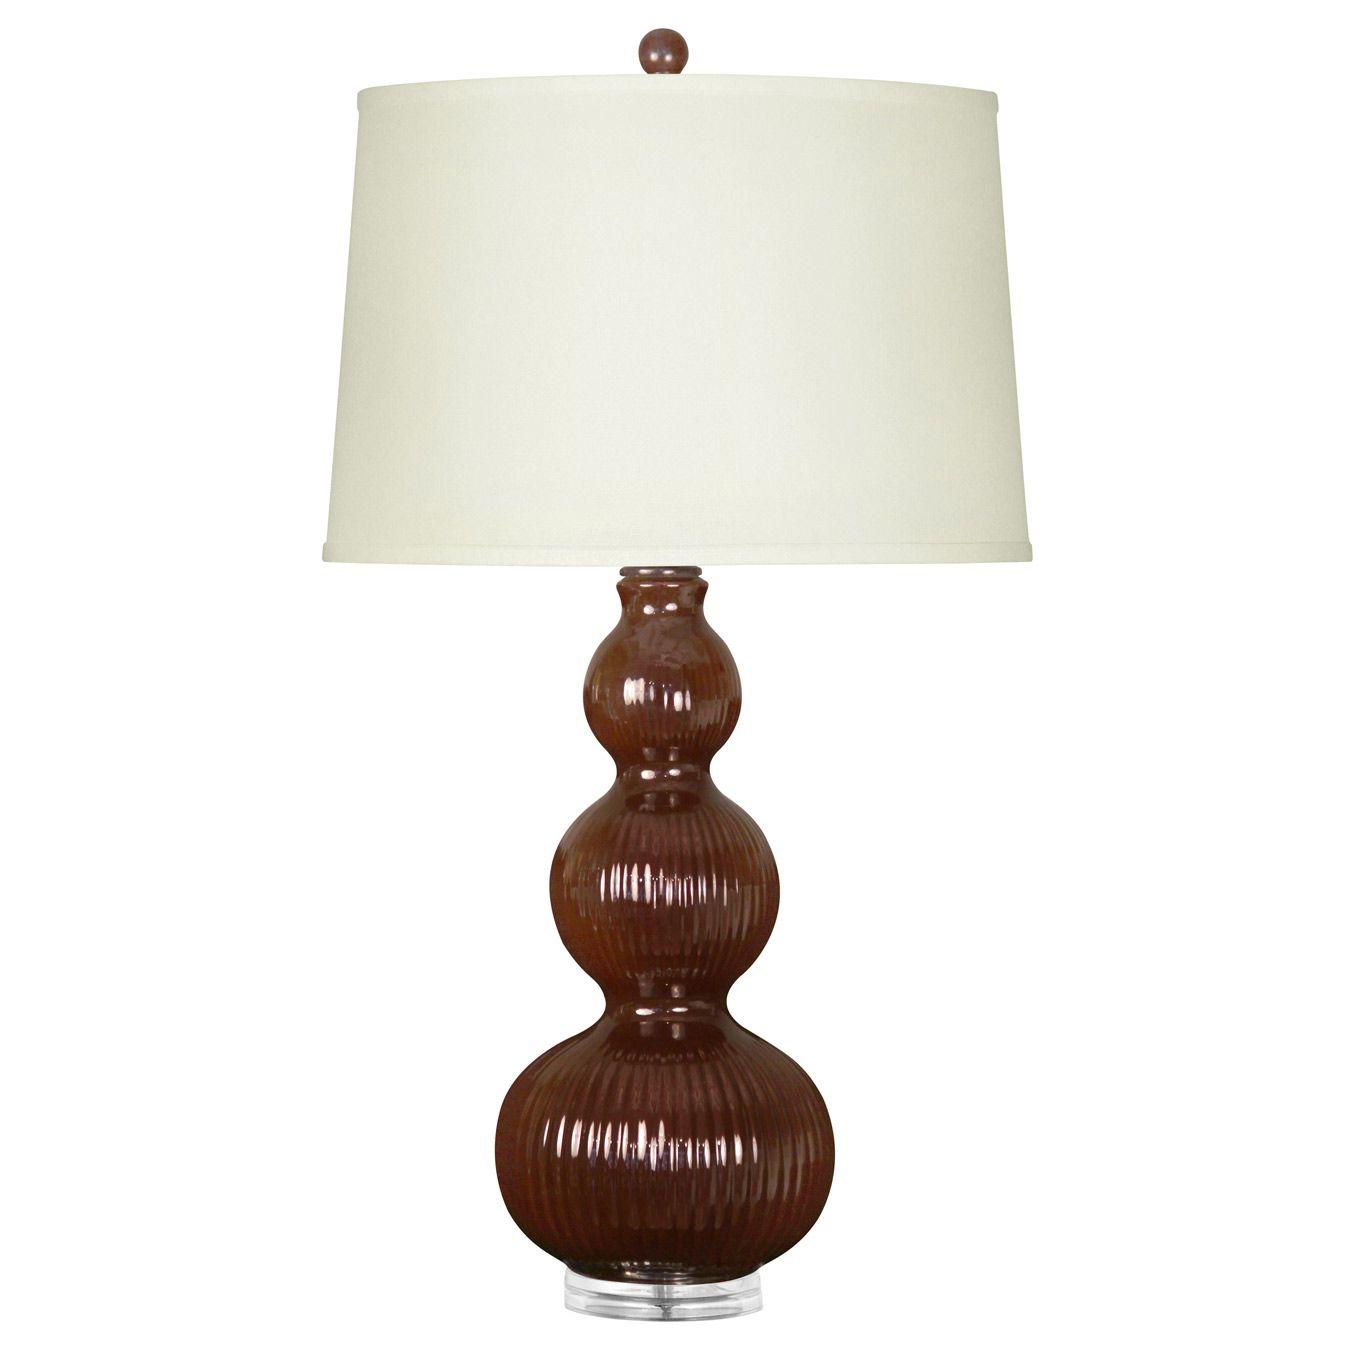 Bungalow 5 Flora Dark Brown Table Lamp Base B5flo800204 Brown Table Lamps Table Lamp Base Lamp Bases